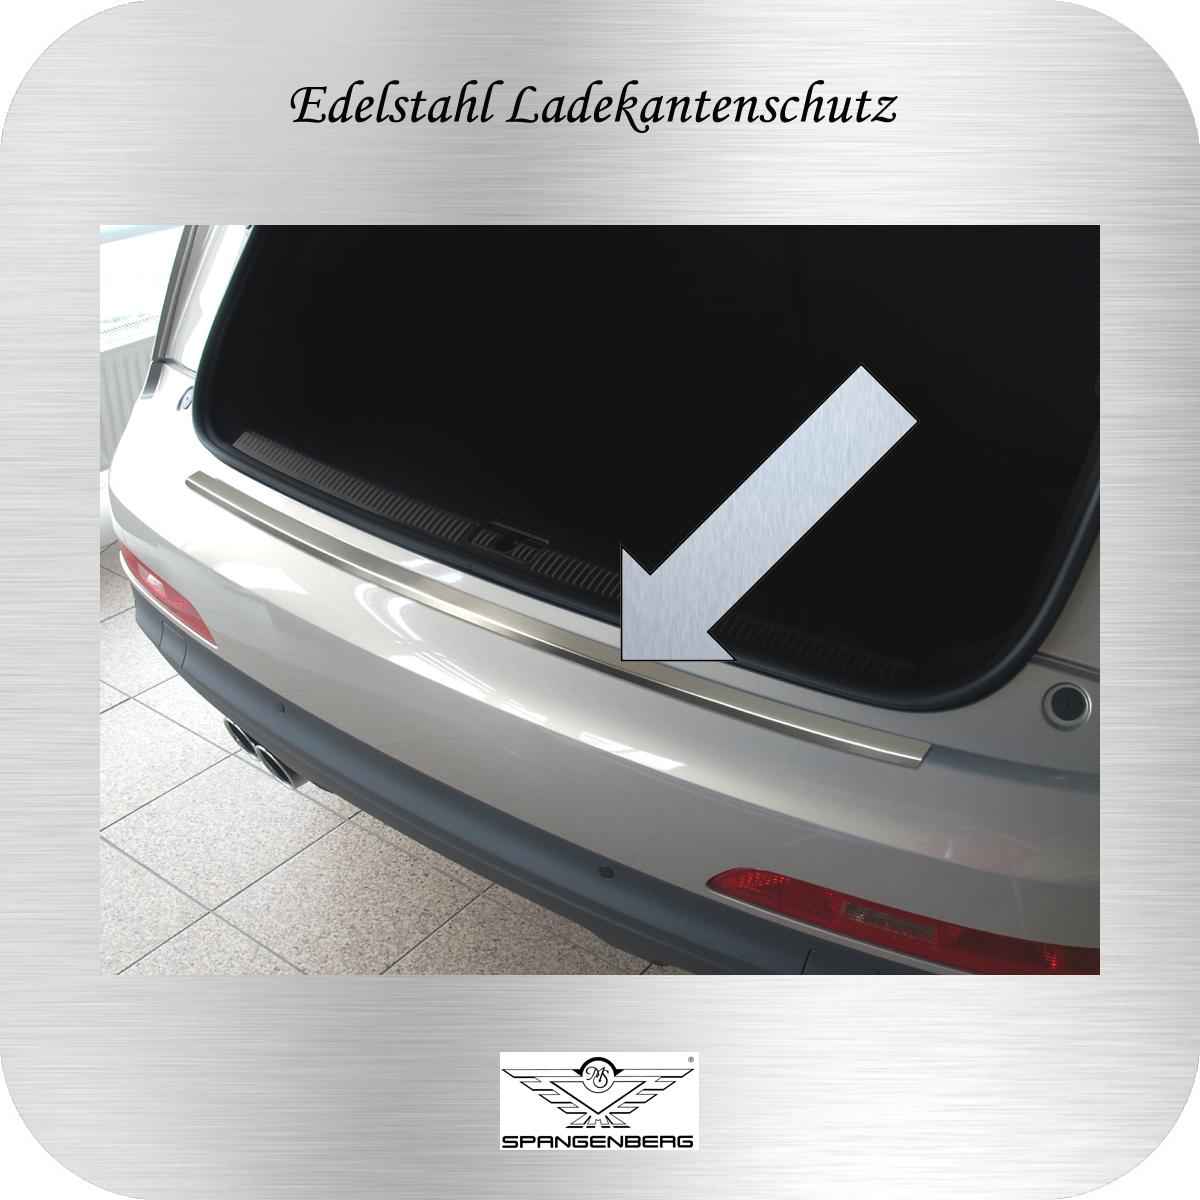 Ladekantenschutz Edelstahl Audi Q3 SUV Typ 8U Kombi 2011-18 3235506